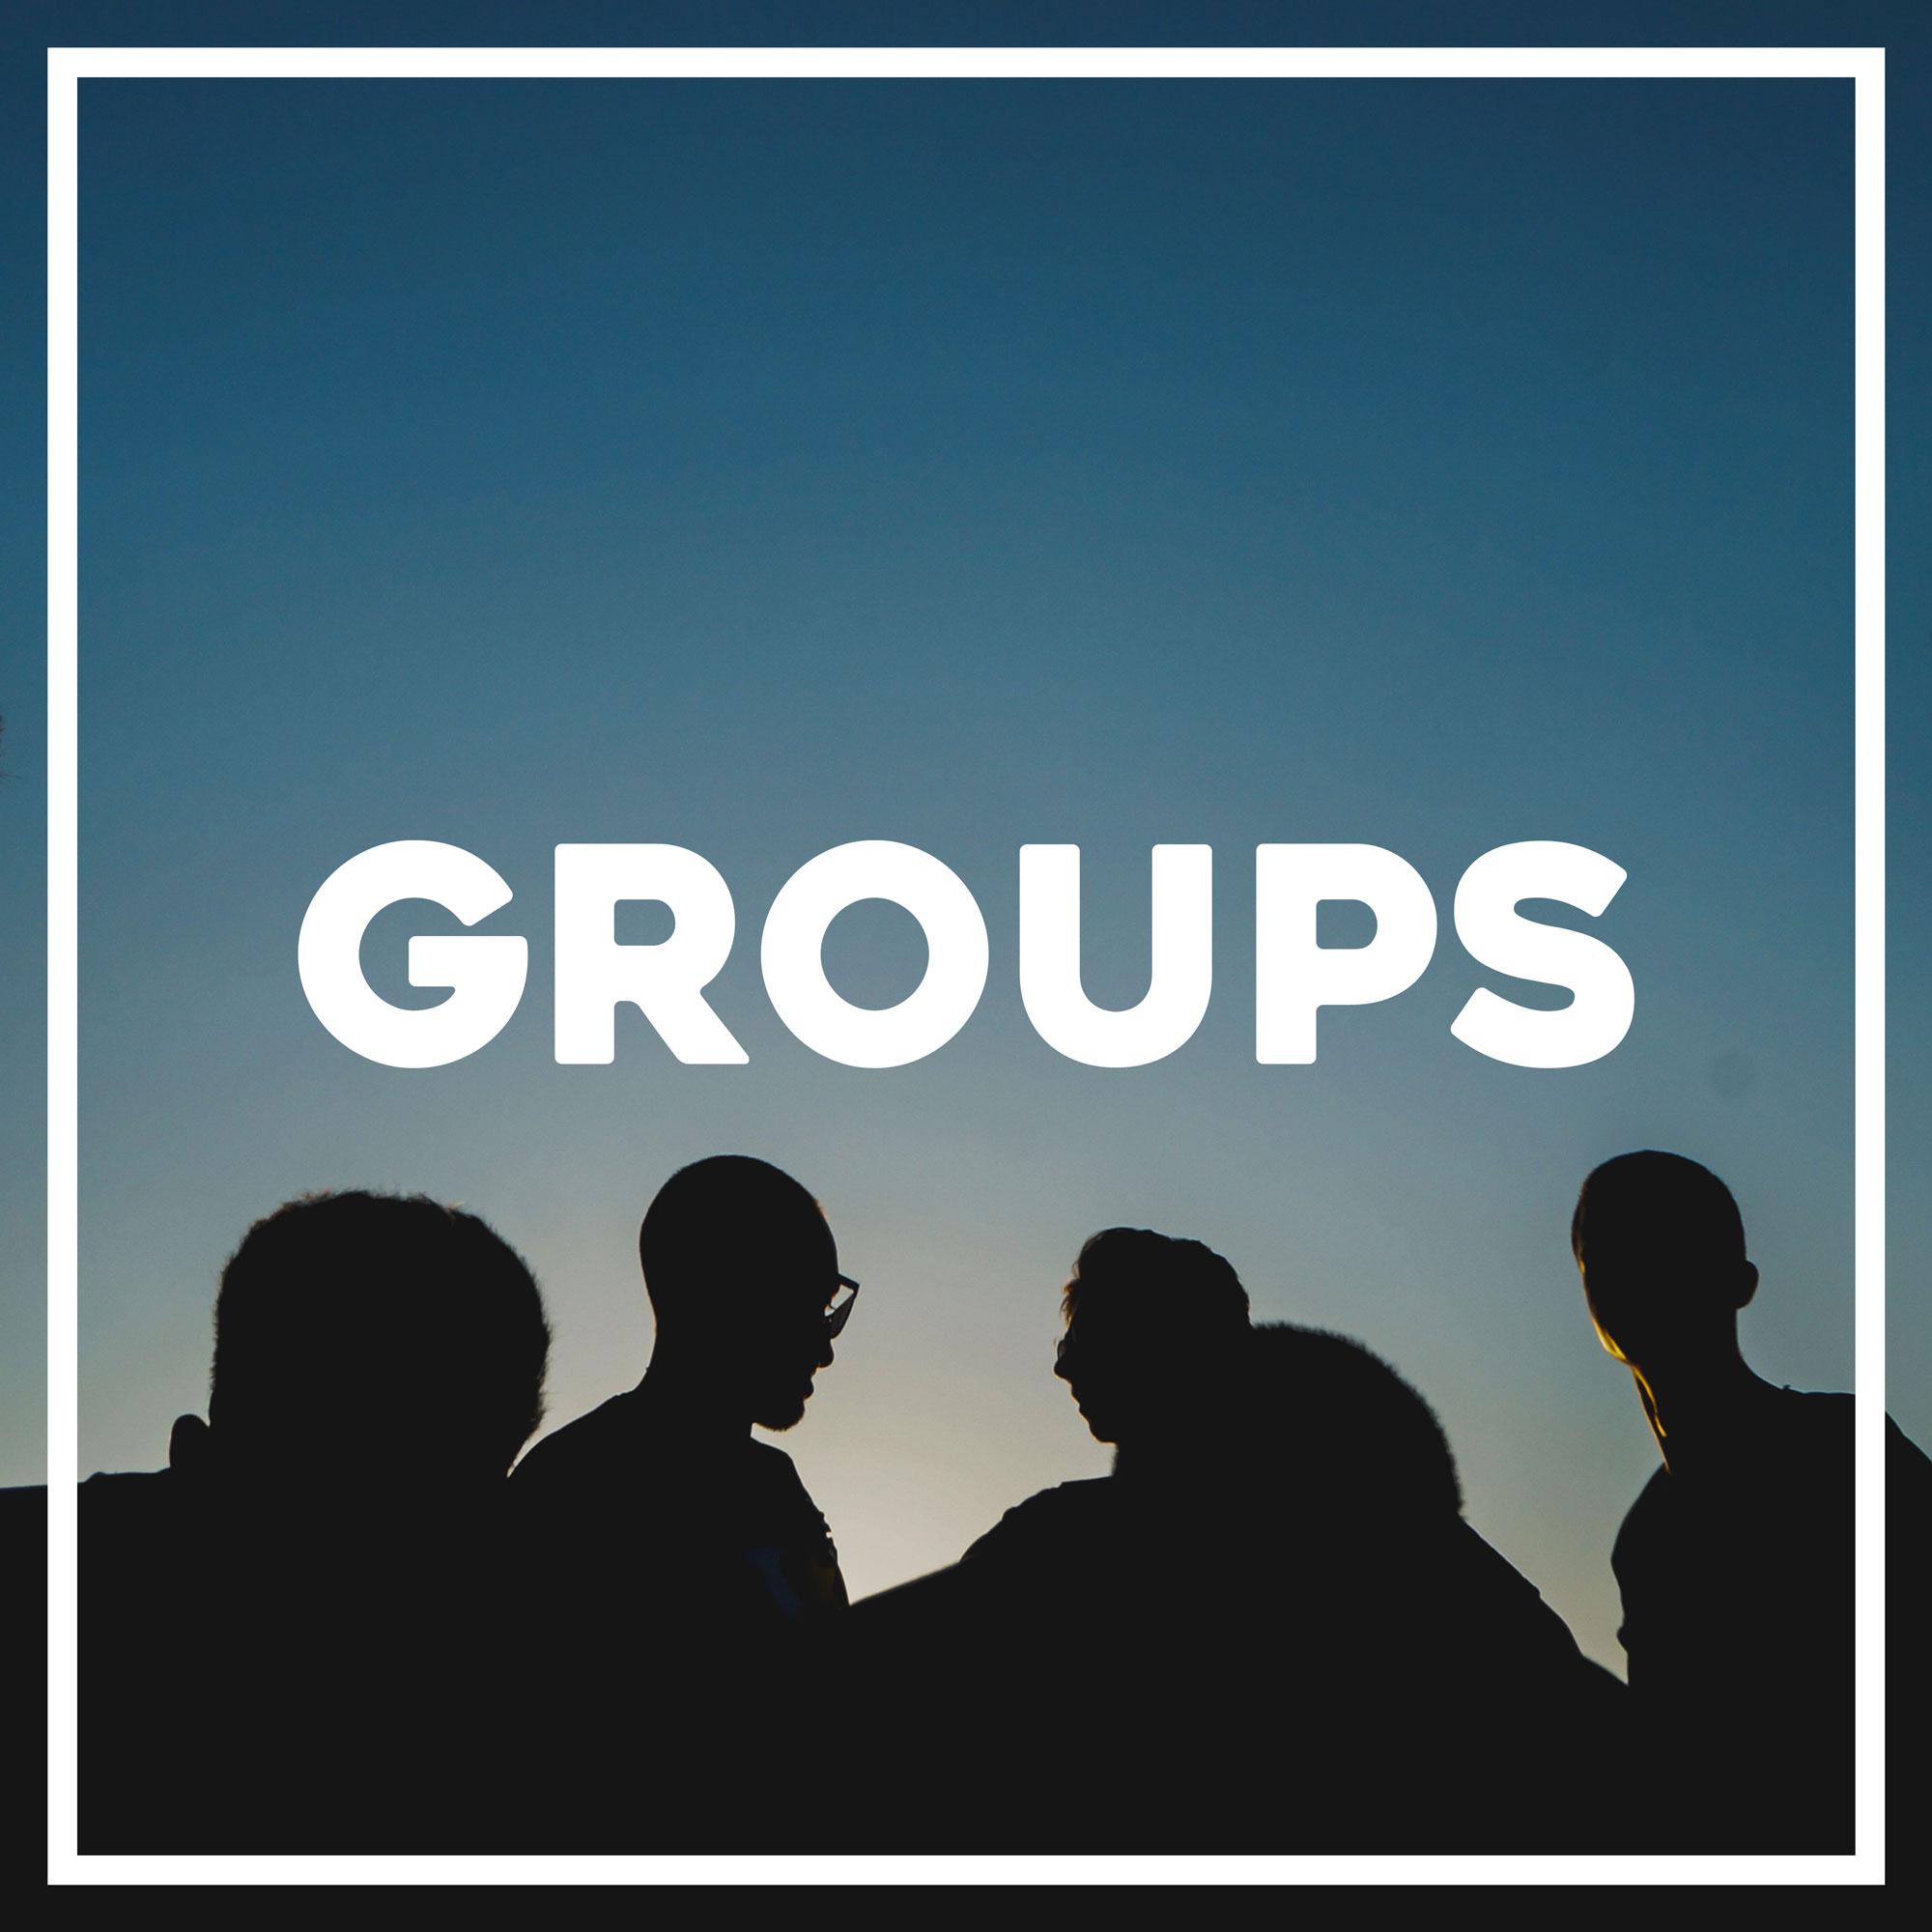 Next-Steps-GROUPS-3.jpg